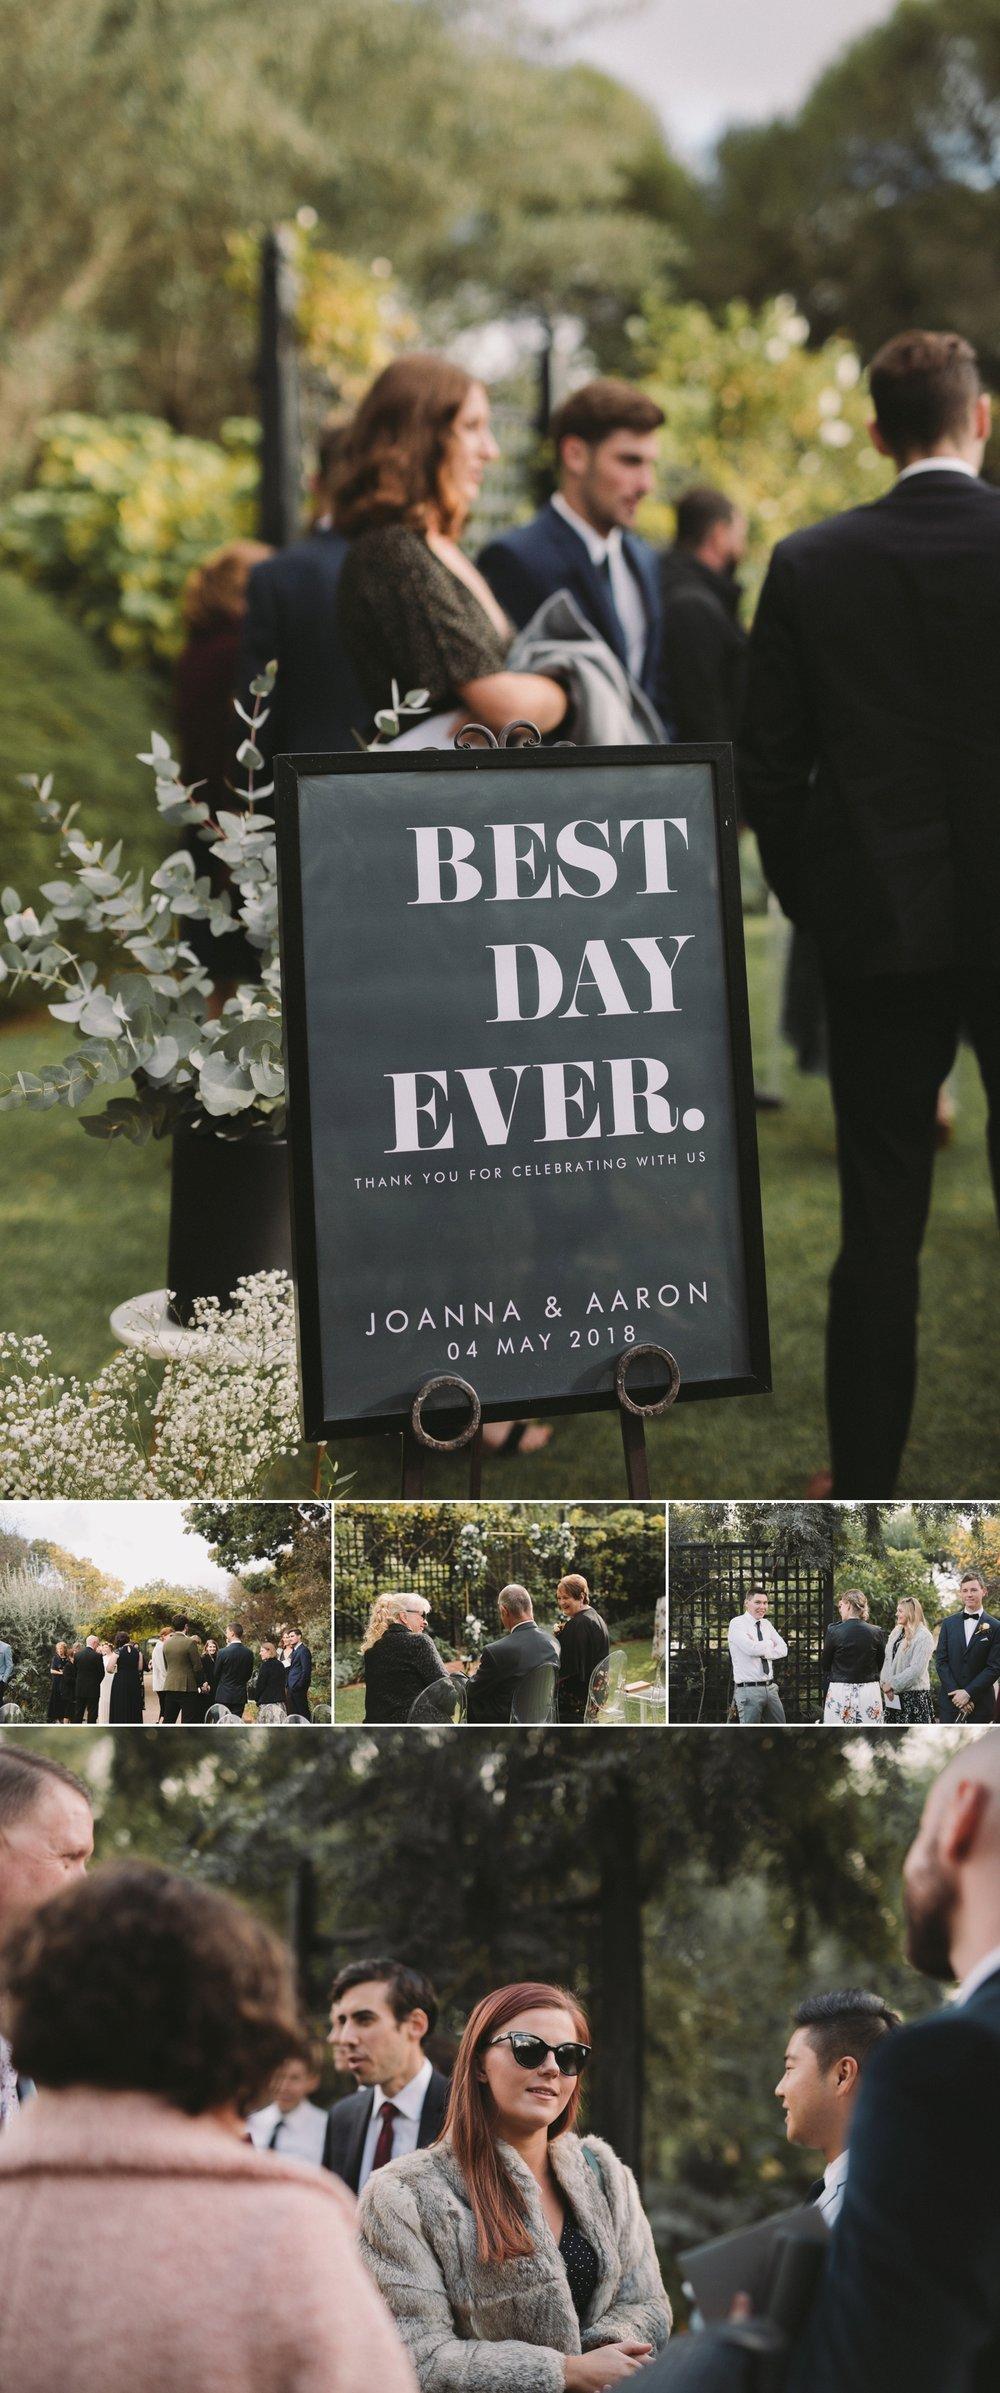 Jo & Aaron - Natural Wedding Photography in Adelaide - Beautiful, modern wedding photographer - Al Ru Farm Wedding Photography - Katherine Schultz_0010.jpg